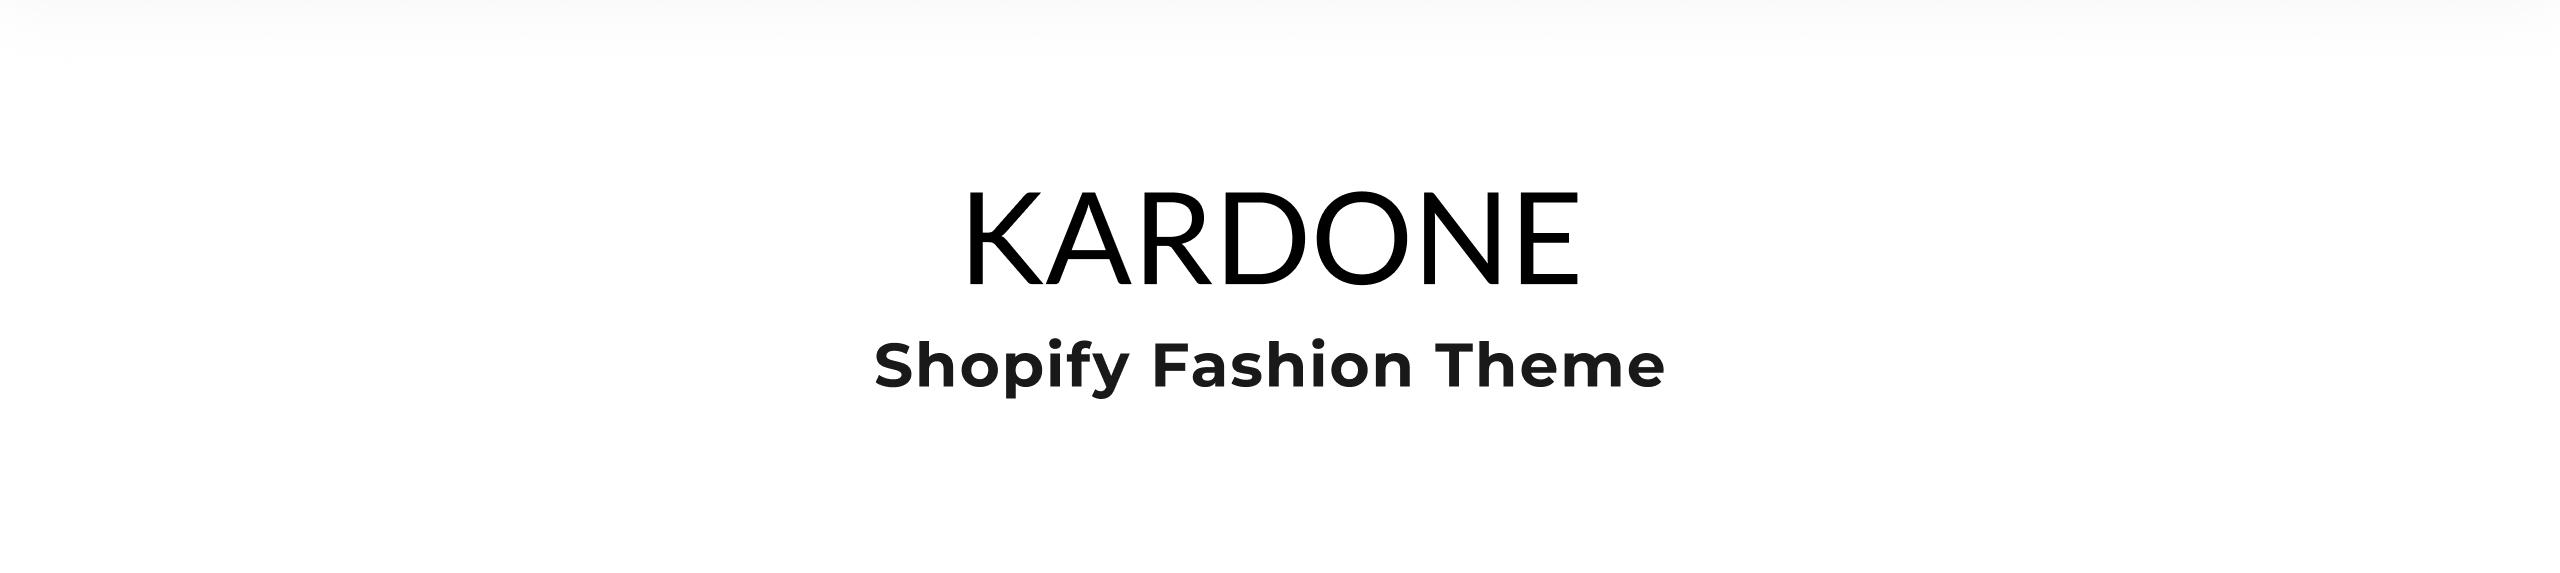 Kardone - Clothing Store Modern Shopify Theme